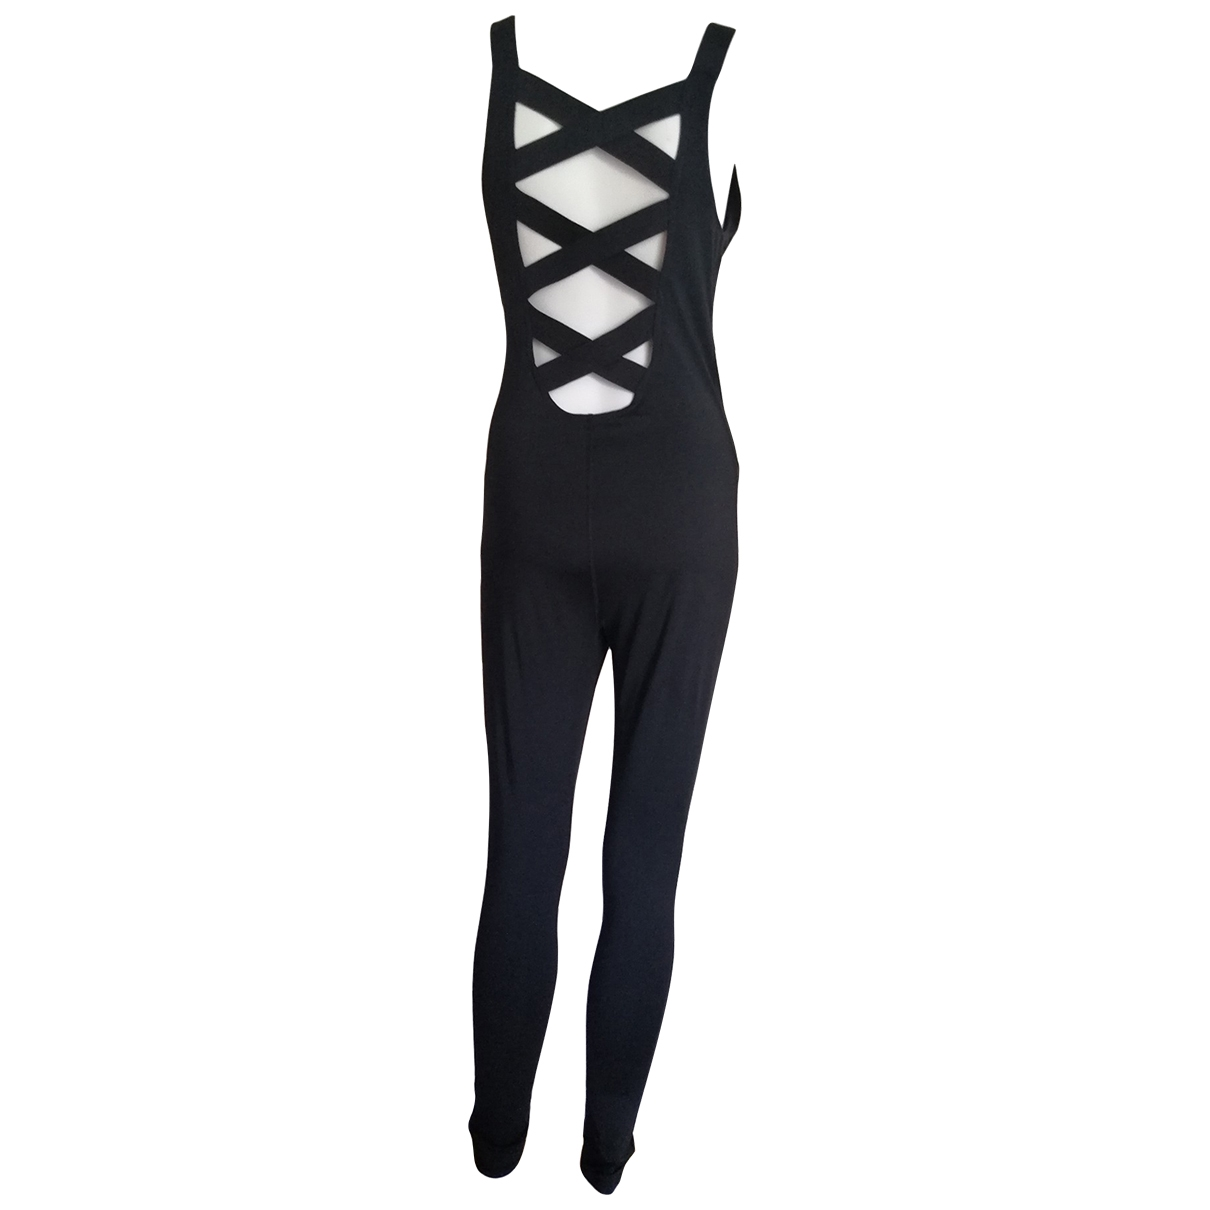 Puma \N Black jumpsuit for Women 40 FR